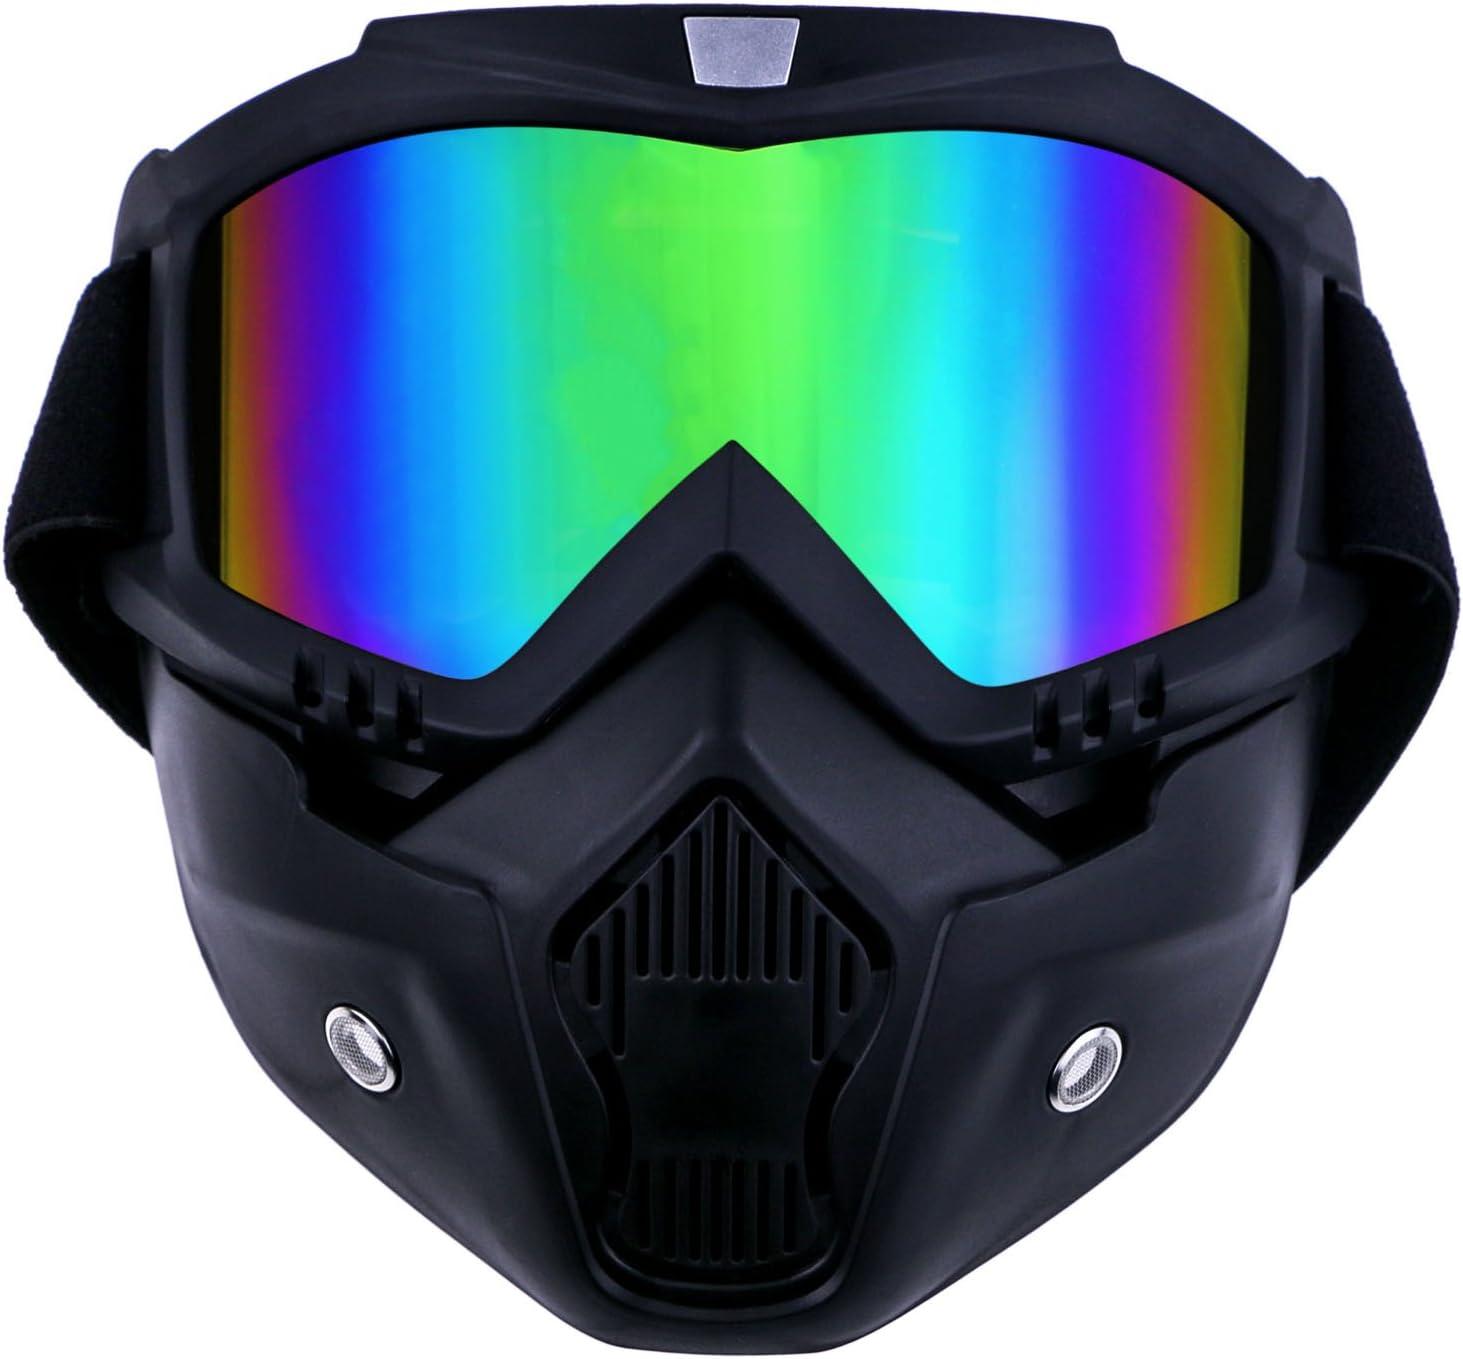 TedGem - Máscara con gafas protectoras desmontables para motocicleta, con filtro para la boca, para cascos abiertos de motocross, ski, snowboard, motocross todoterreno